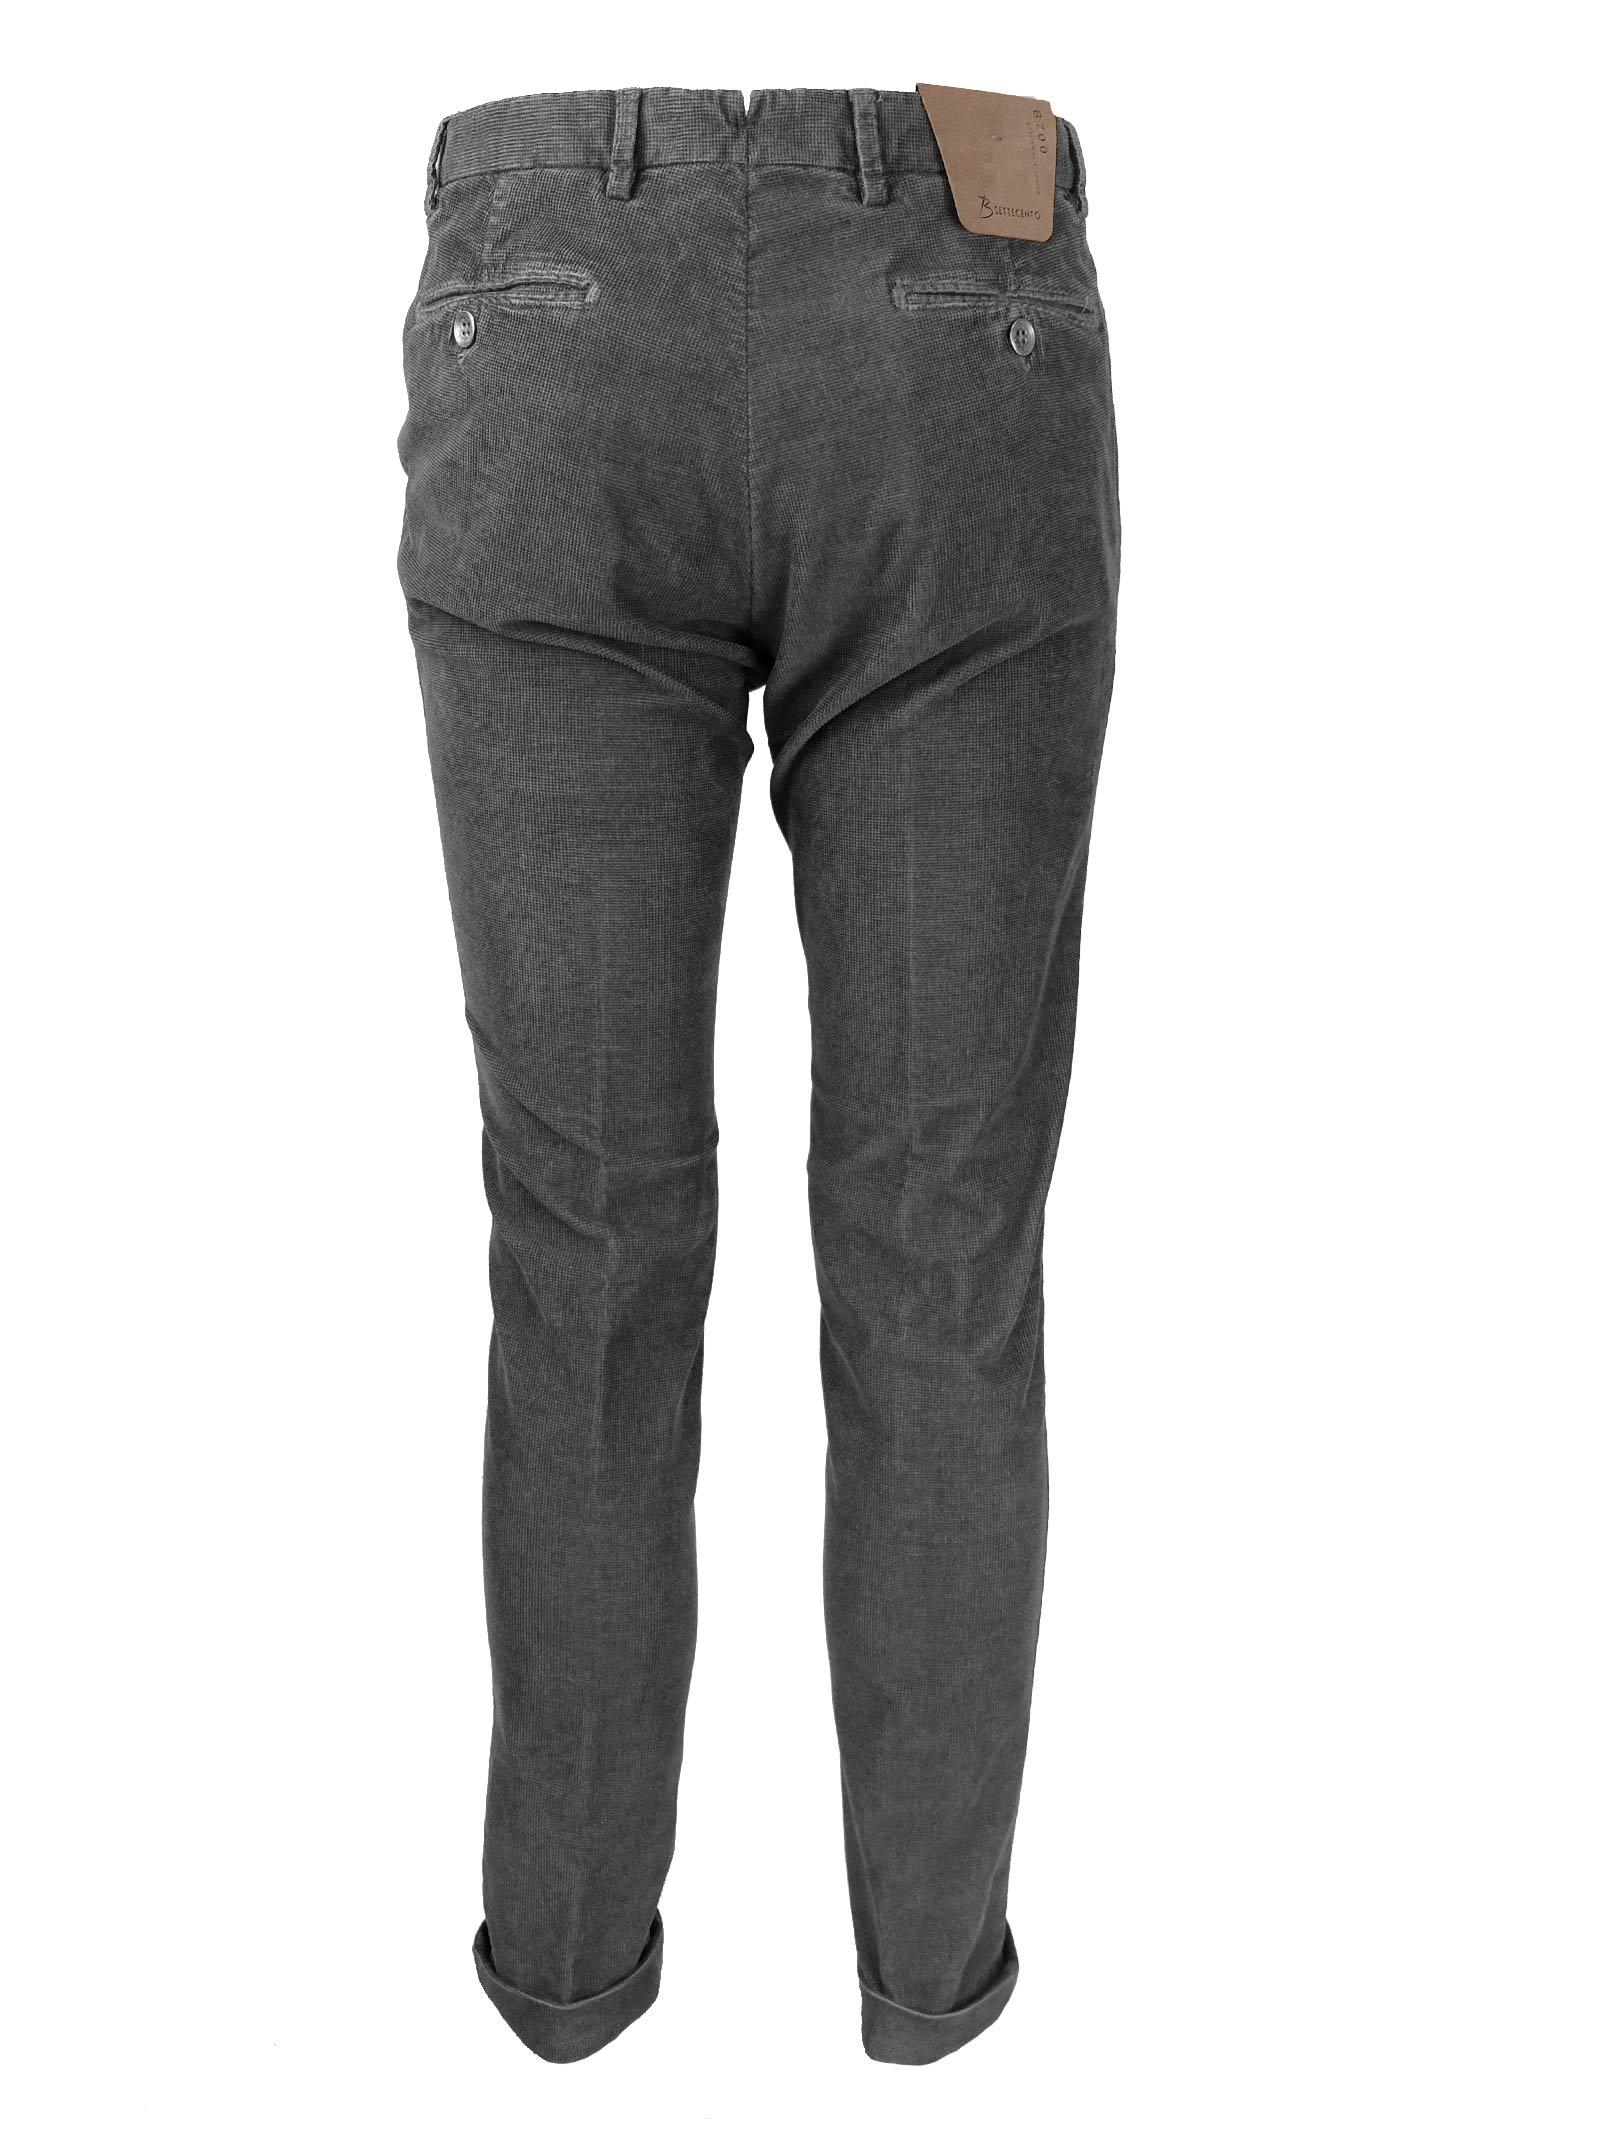 B700 | Trousers | MH700 802643